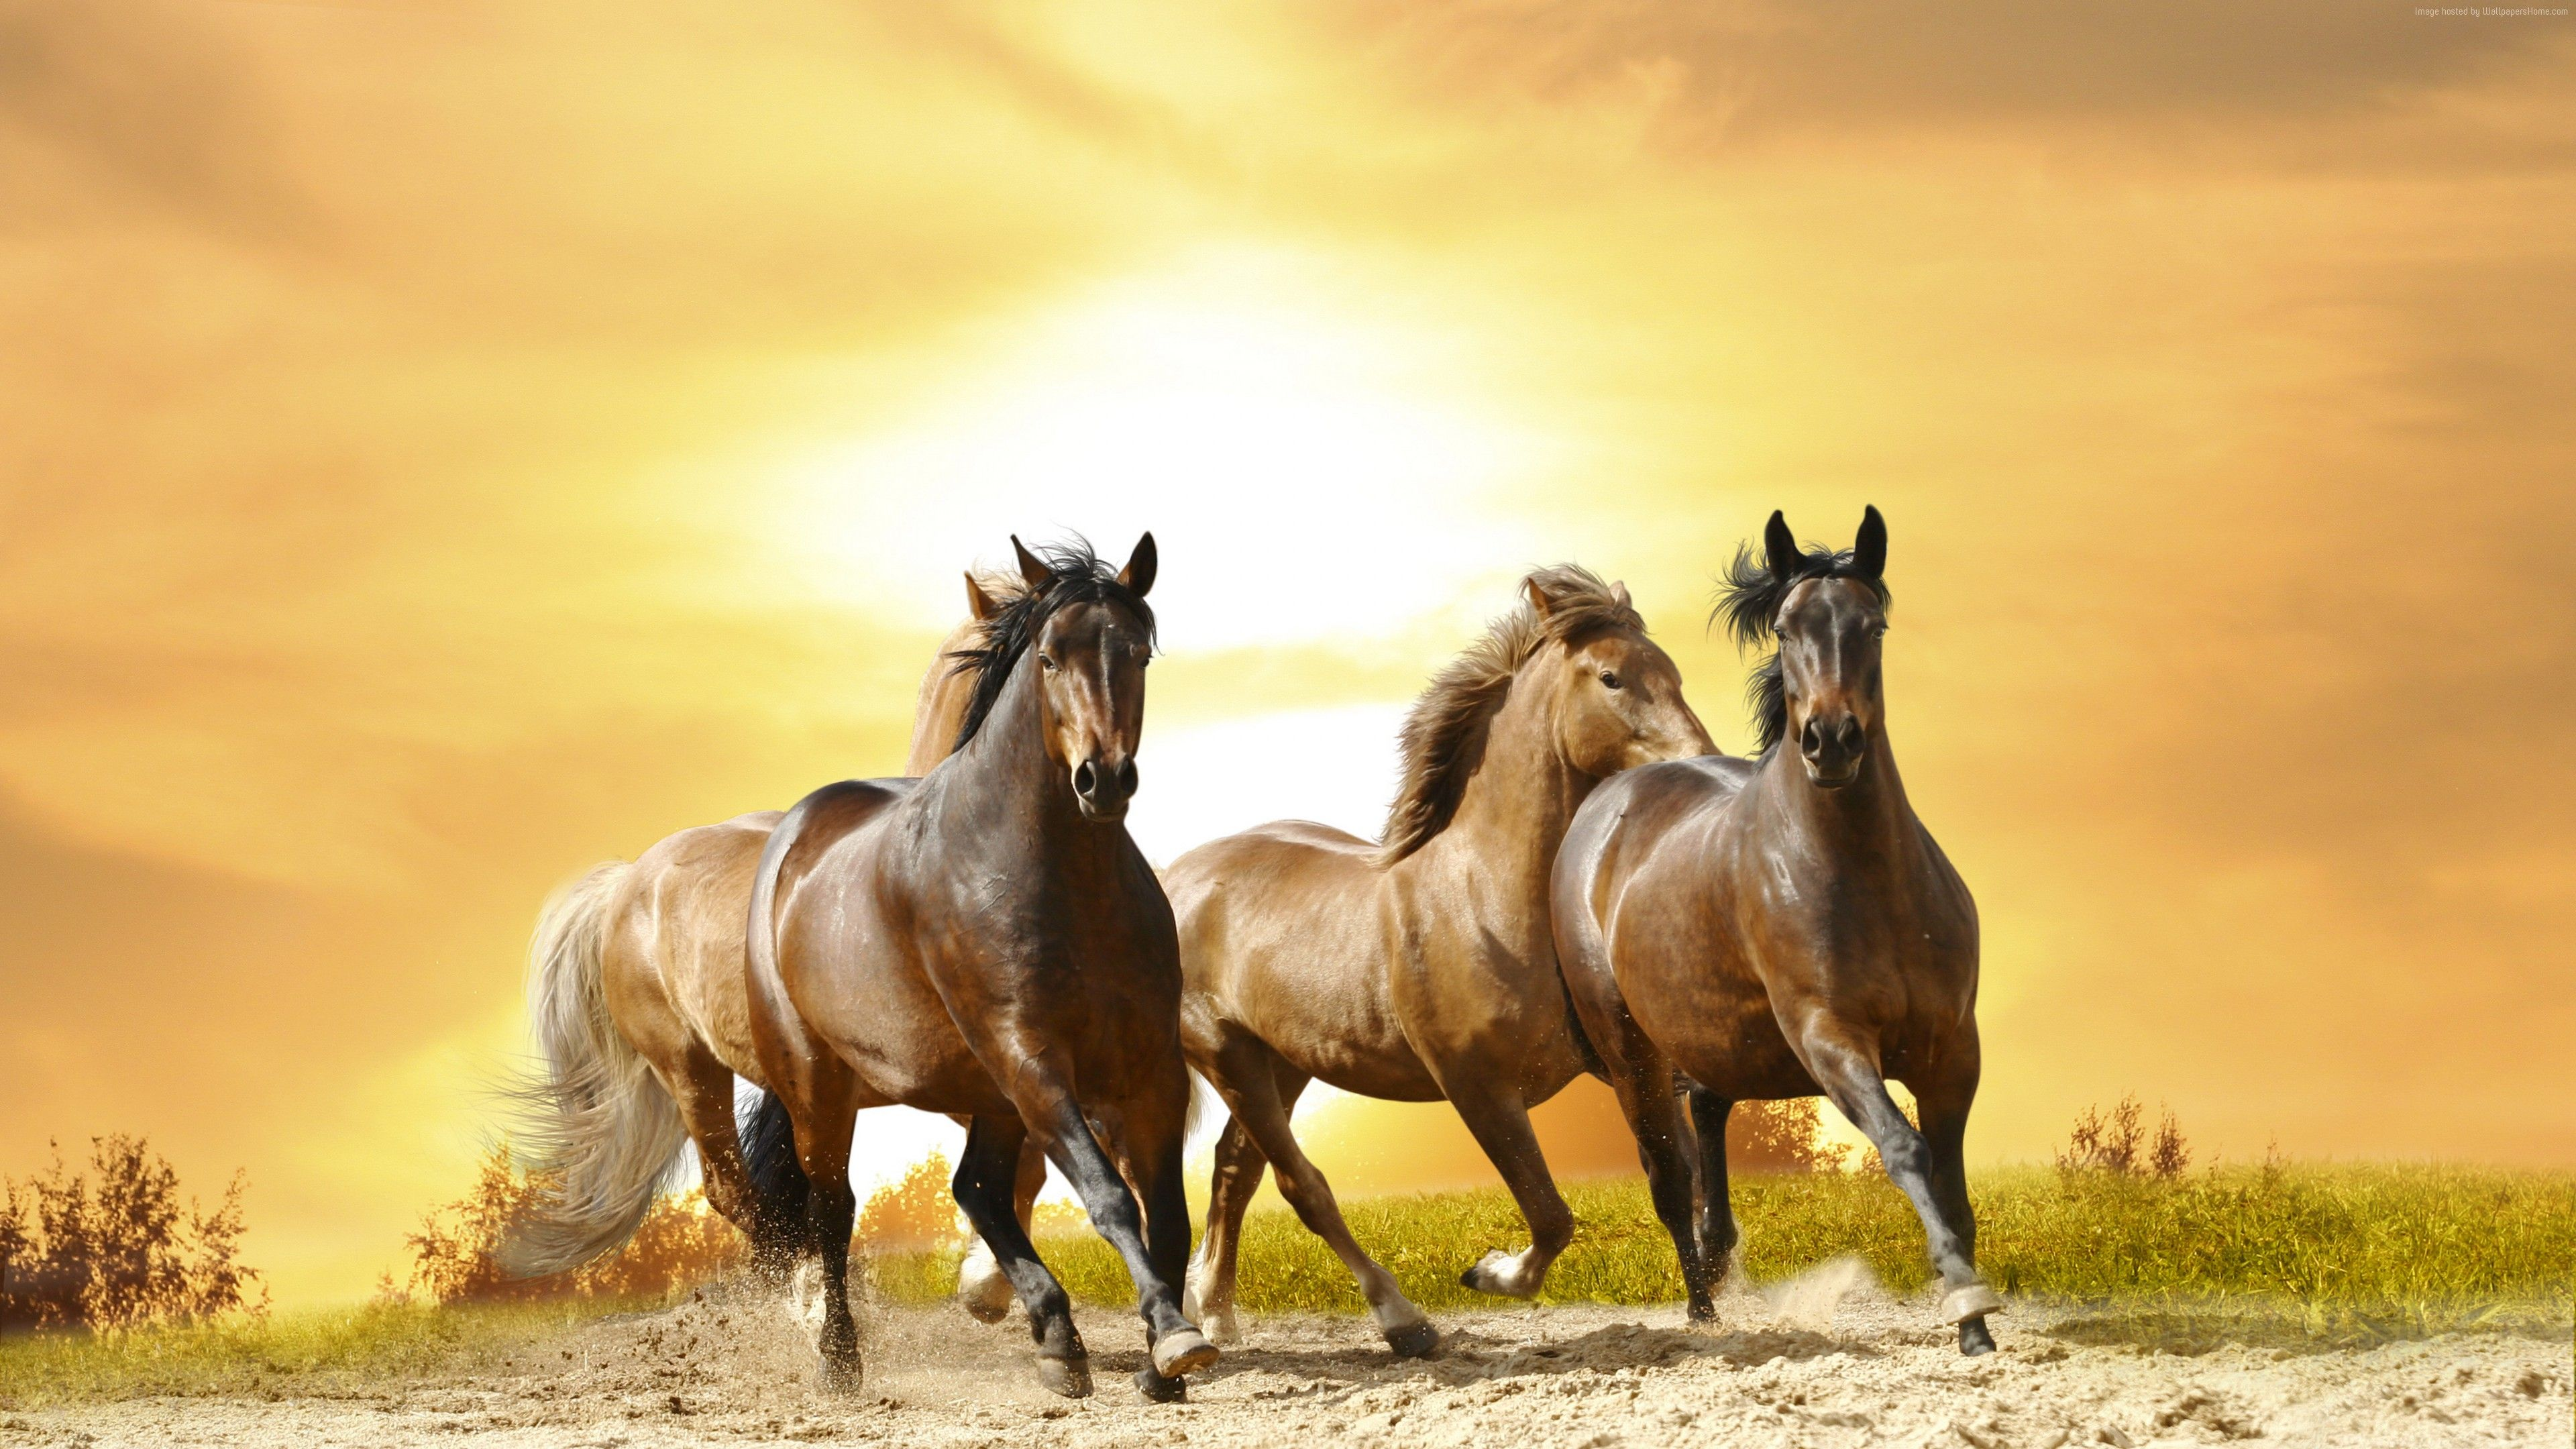 Wallpaper Horses Cute Animals 8k Https Livewallpaperswide Com Animals Wallpaper Horses Cute Animals 8k 9193 8k Cute Animals Horse Wall Art Horse Wall Horses